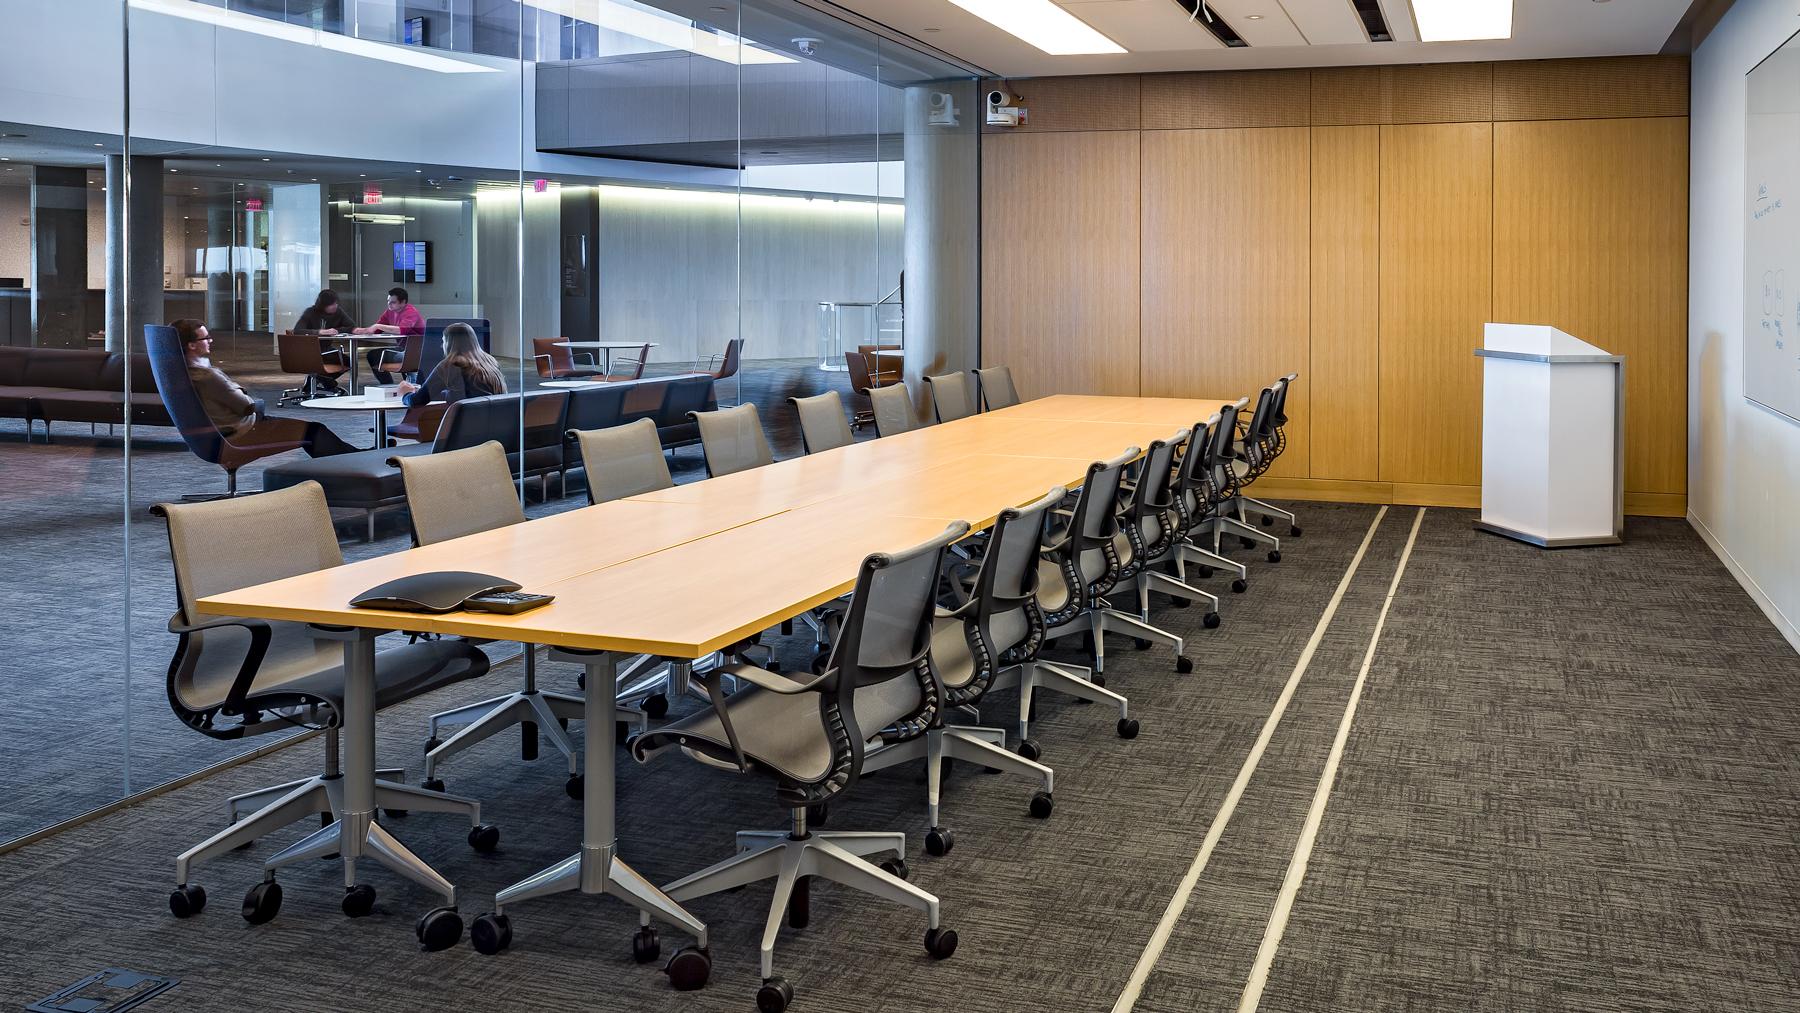 Rm 4301 Research Seminar Room